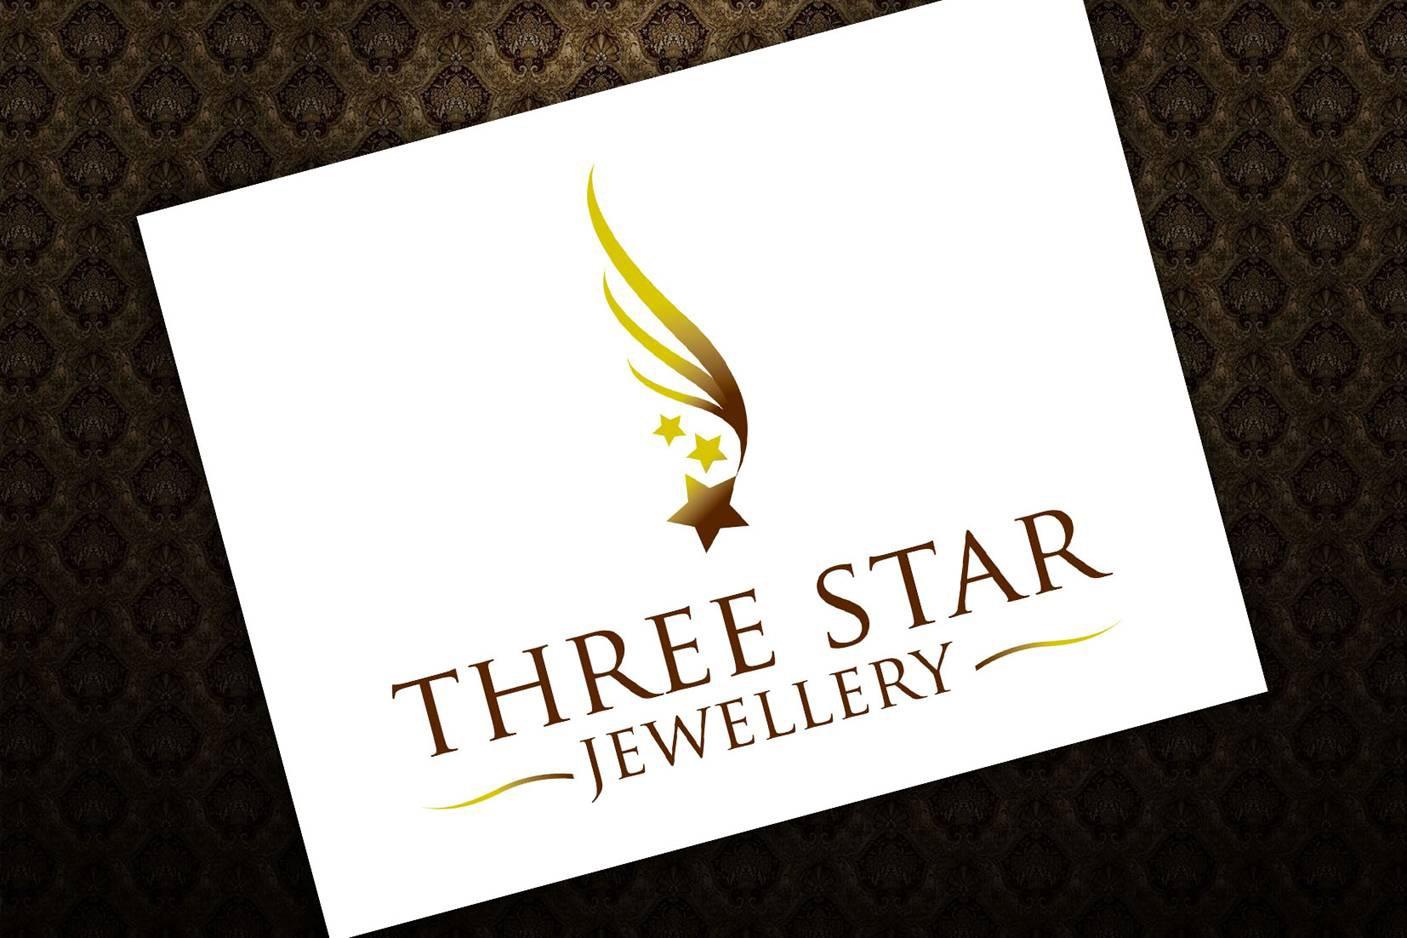 3star-jewellery5